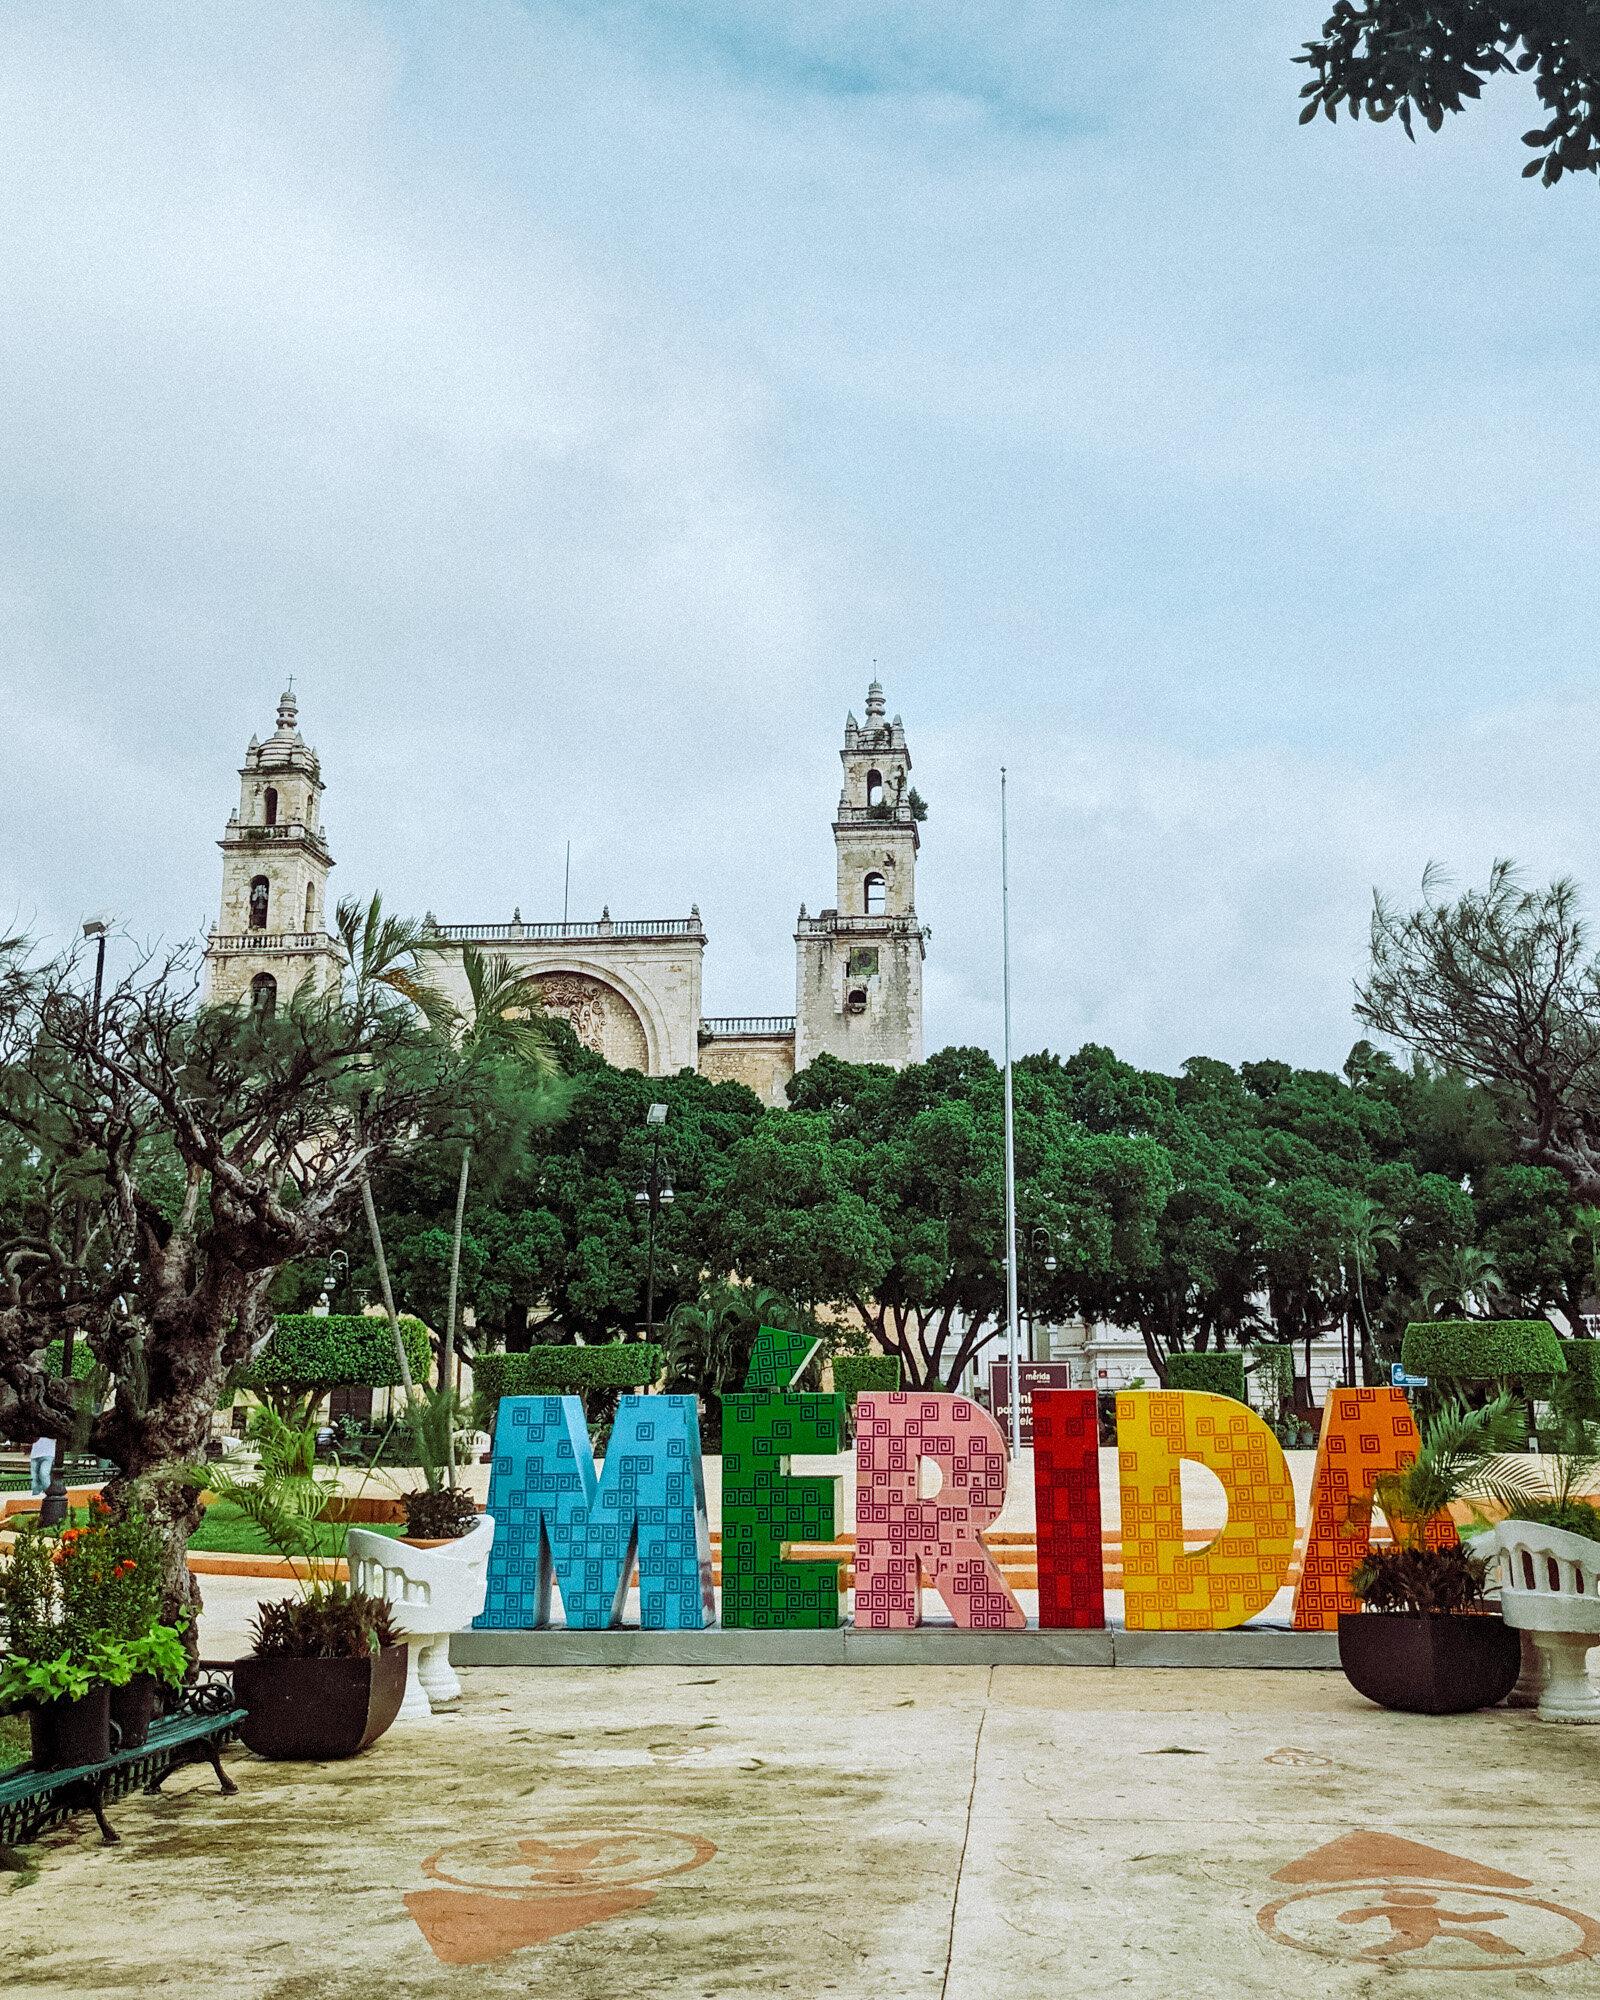 Rachel Off Duty: The Plaza Grande in Merida, Mexico